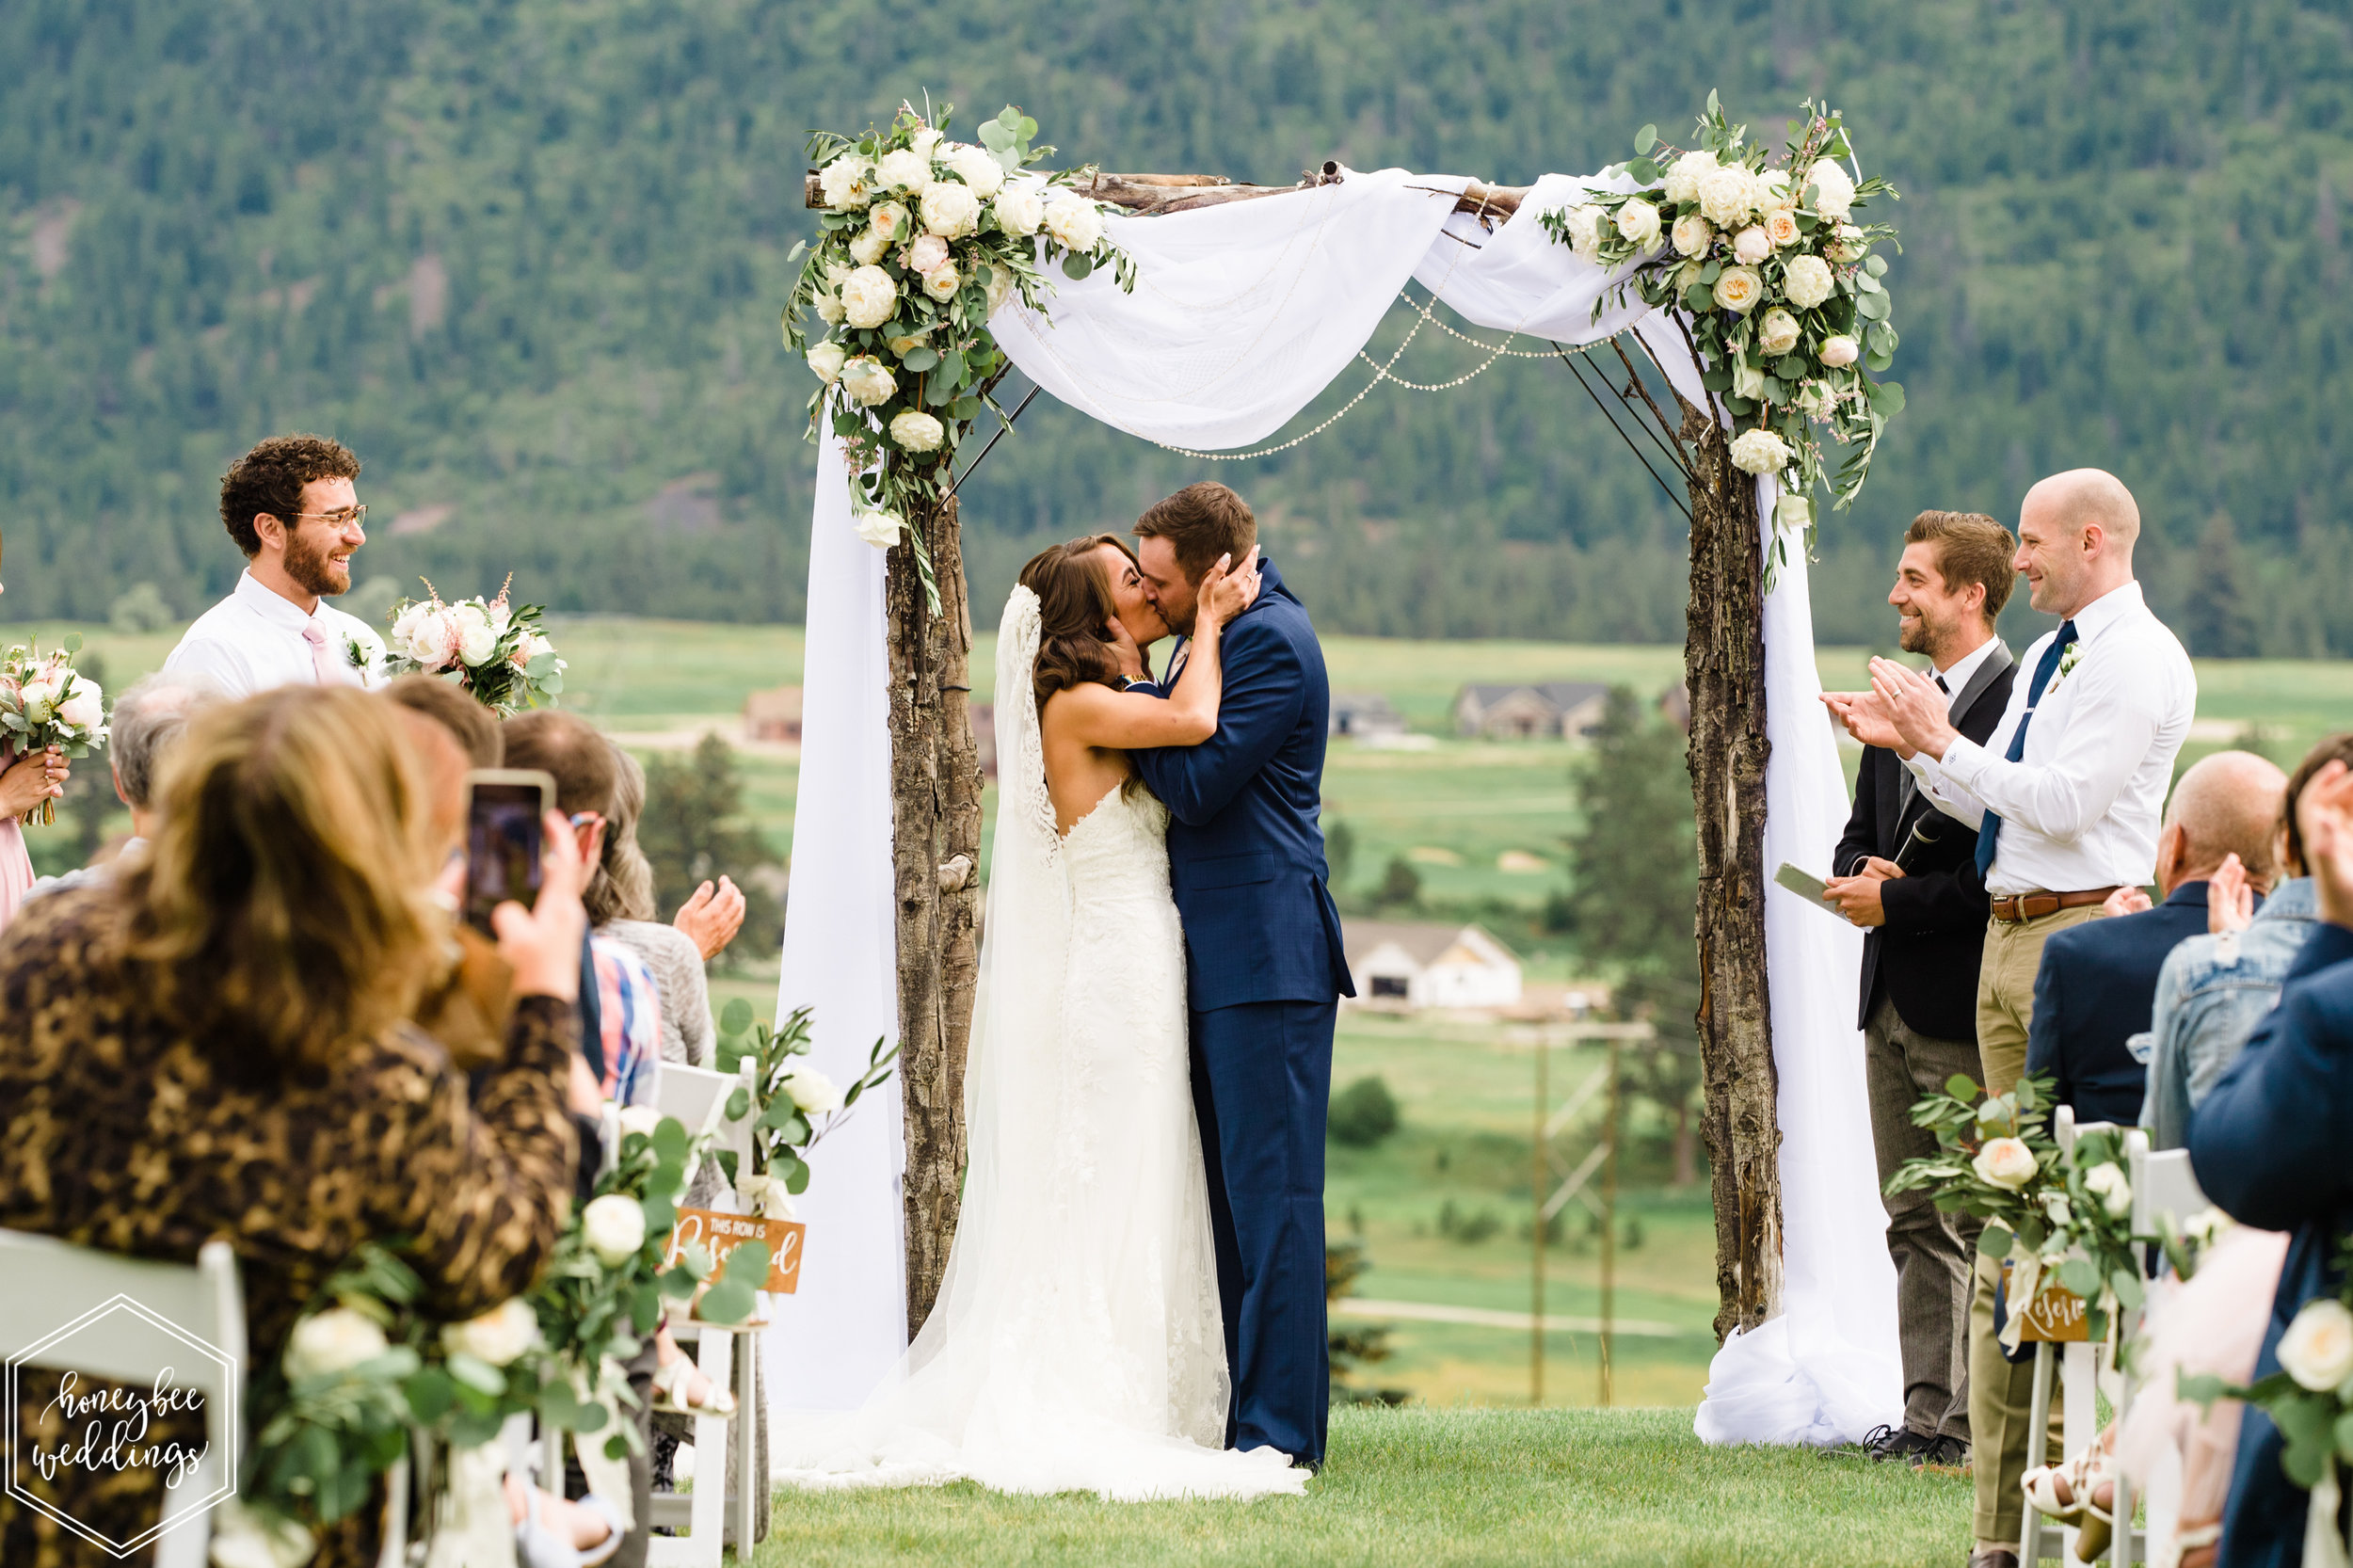 068Montana Wedding Photographer_Missoula Wedding_Honeybee Weddings_Devlin & Jacob_June 22, 2019-1721.jpg